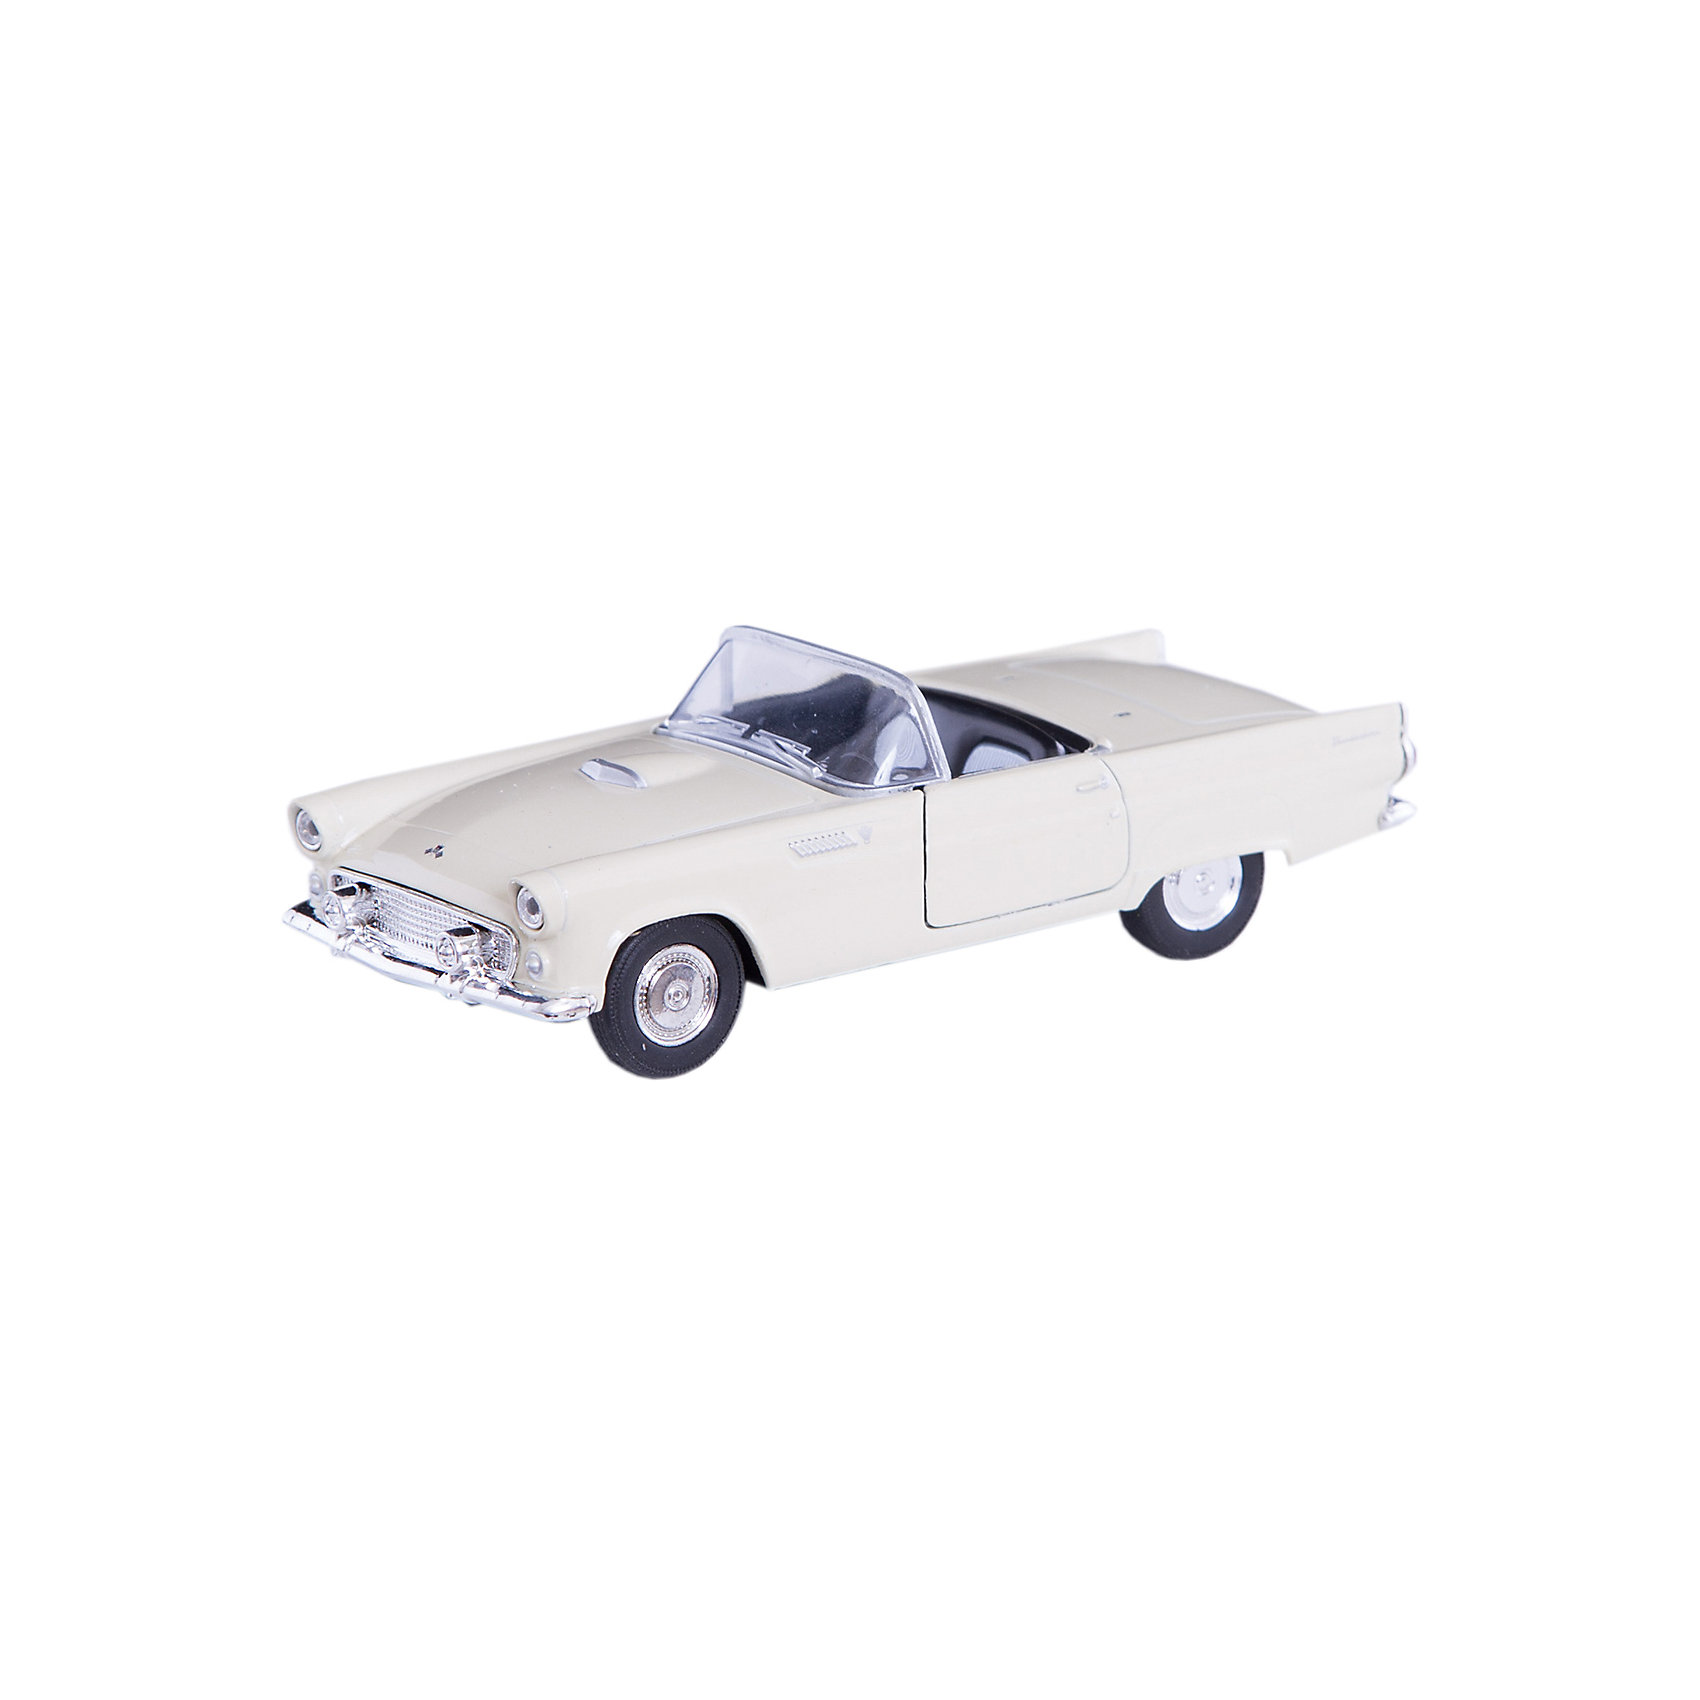 Модель винтажной машины 1:34-39 Ford Thunderbird 1955, Welly